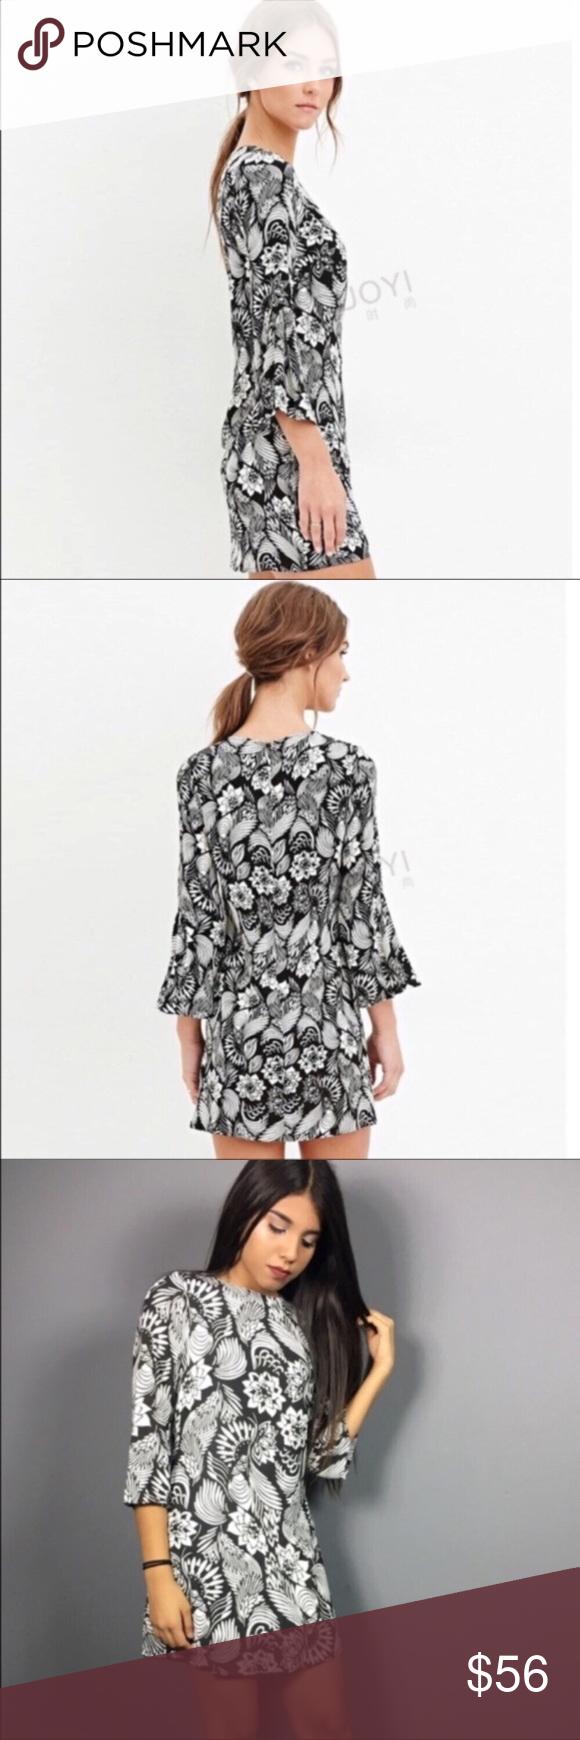 Beautiful Floral Print Mini Dress Beautiful Black And White